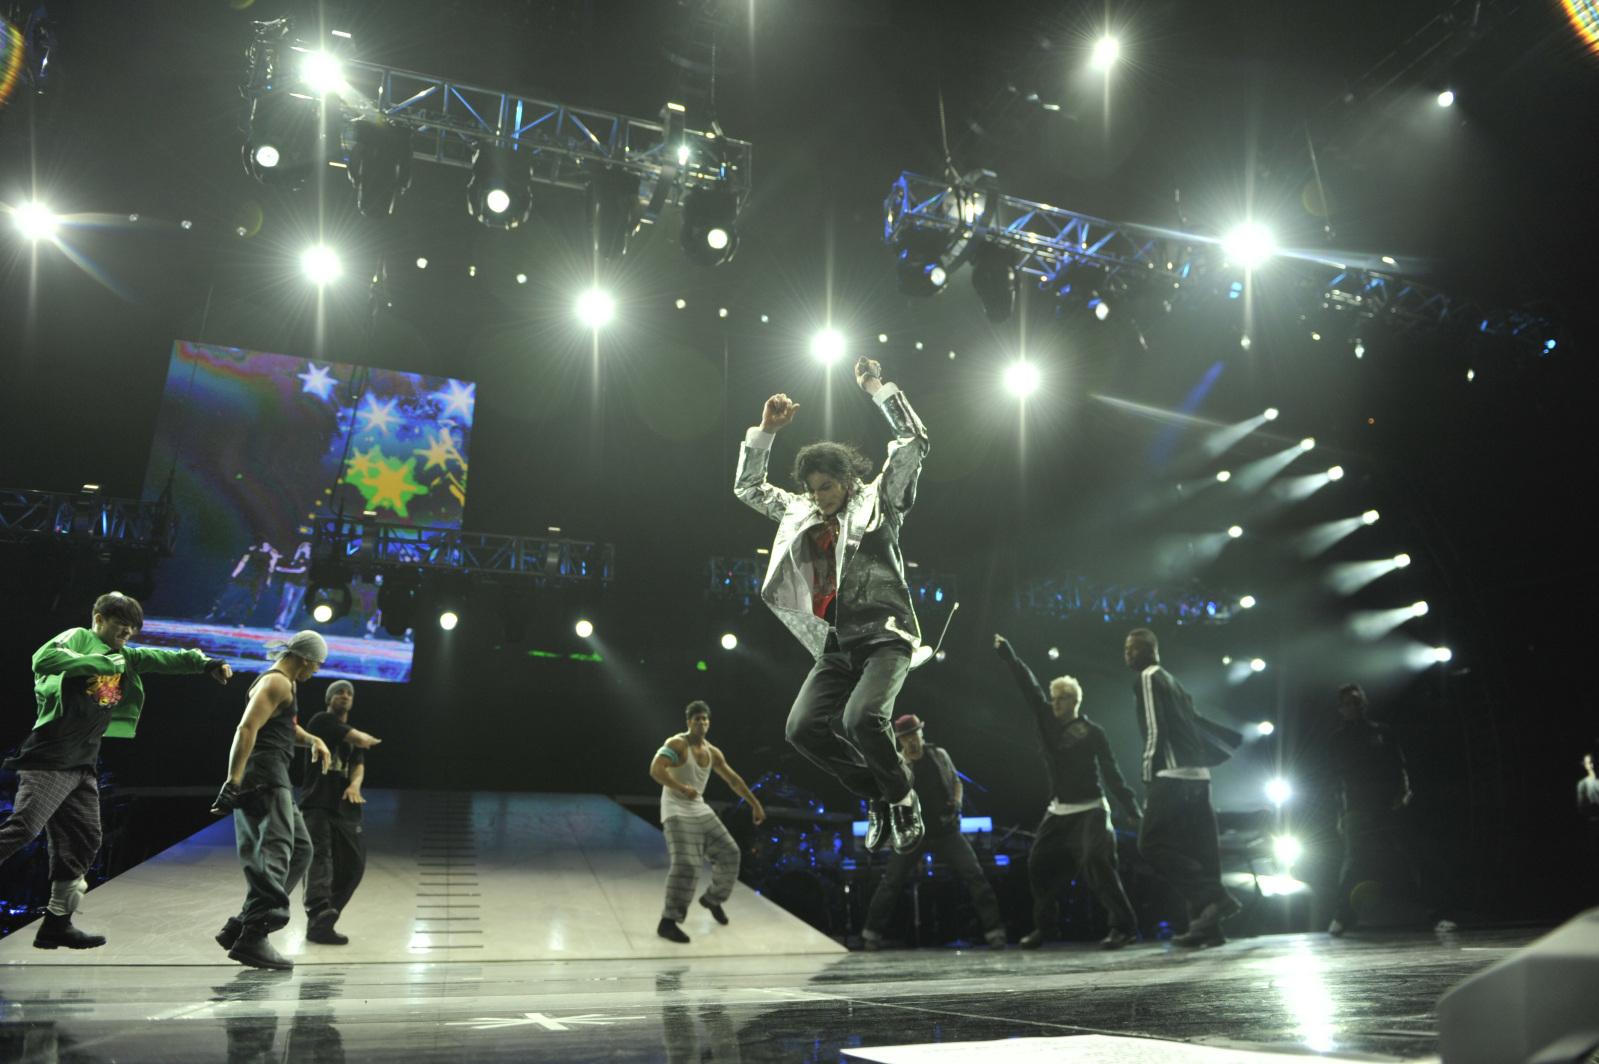 http://4.bp.blogspot.com/__iuYbs5zGVw/TRbWMRYRiwI/AAAAAAAAASw/Tl_WvwkvkDc/s1600/michael-jackson-this-is-it-jumping.jpg